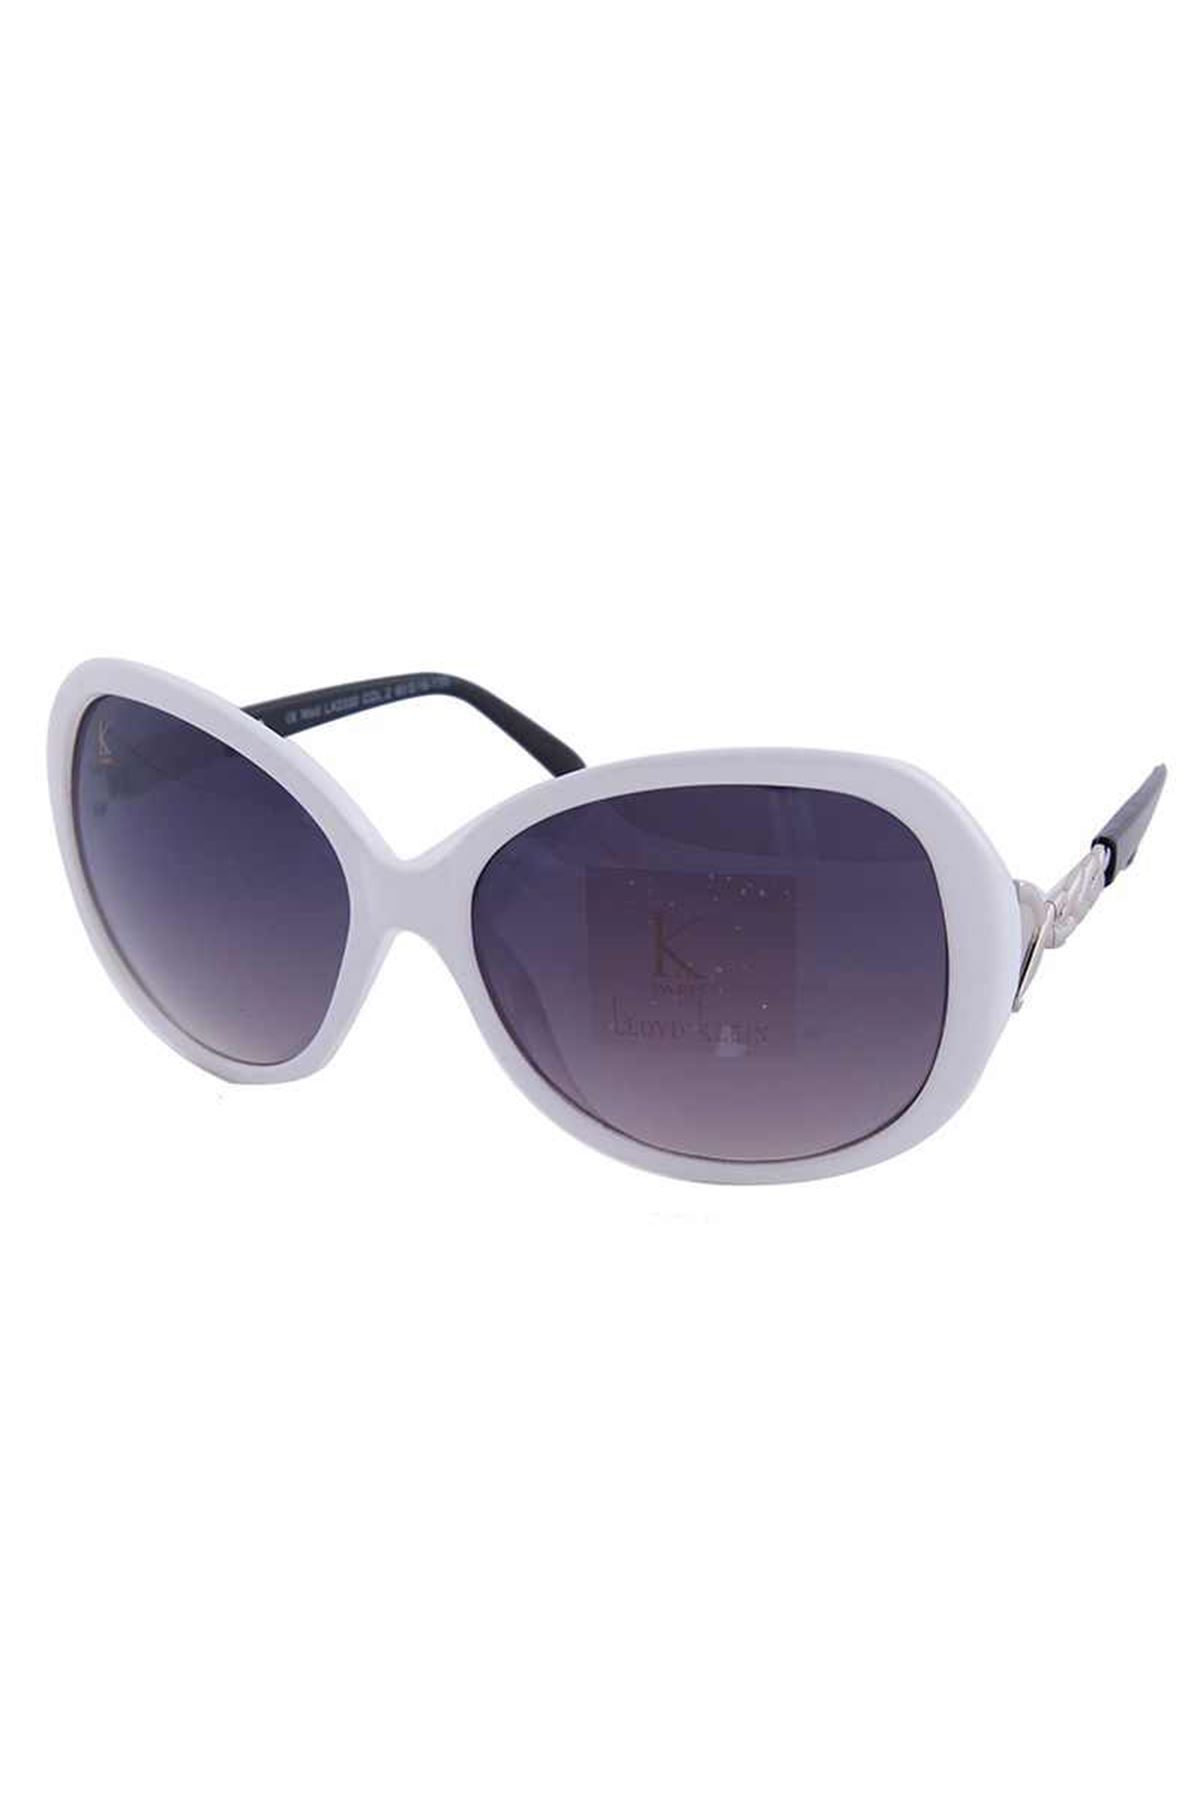 Lloyd Klein Güneş Gözlüğü 35A-72748